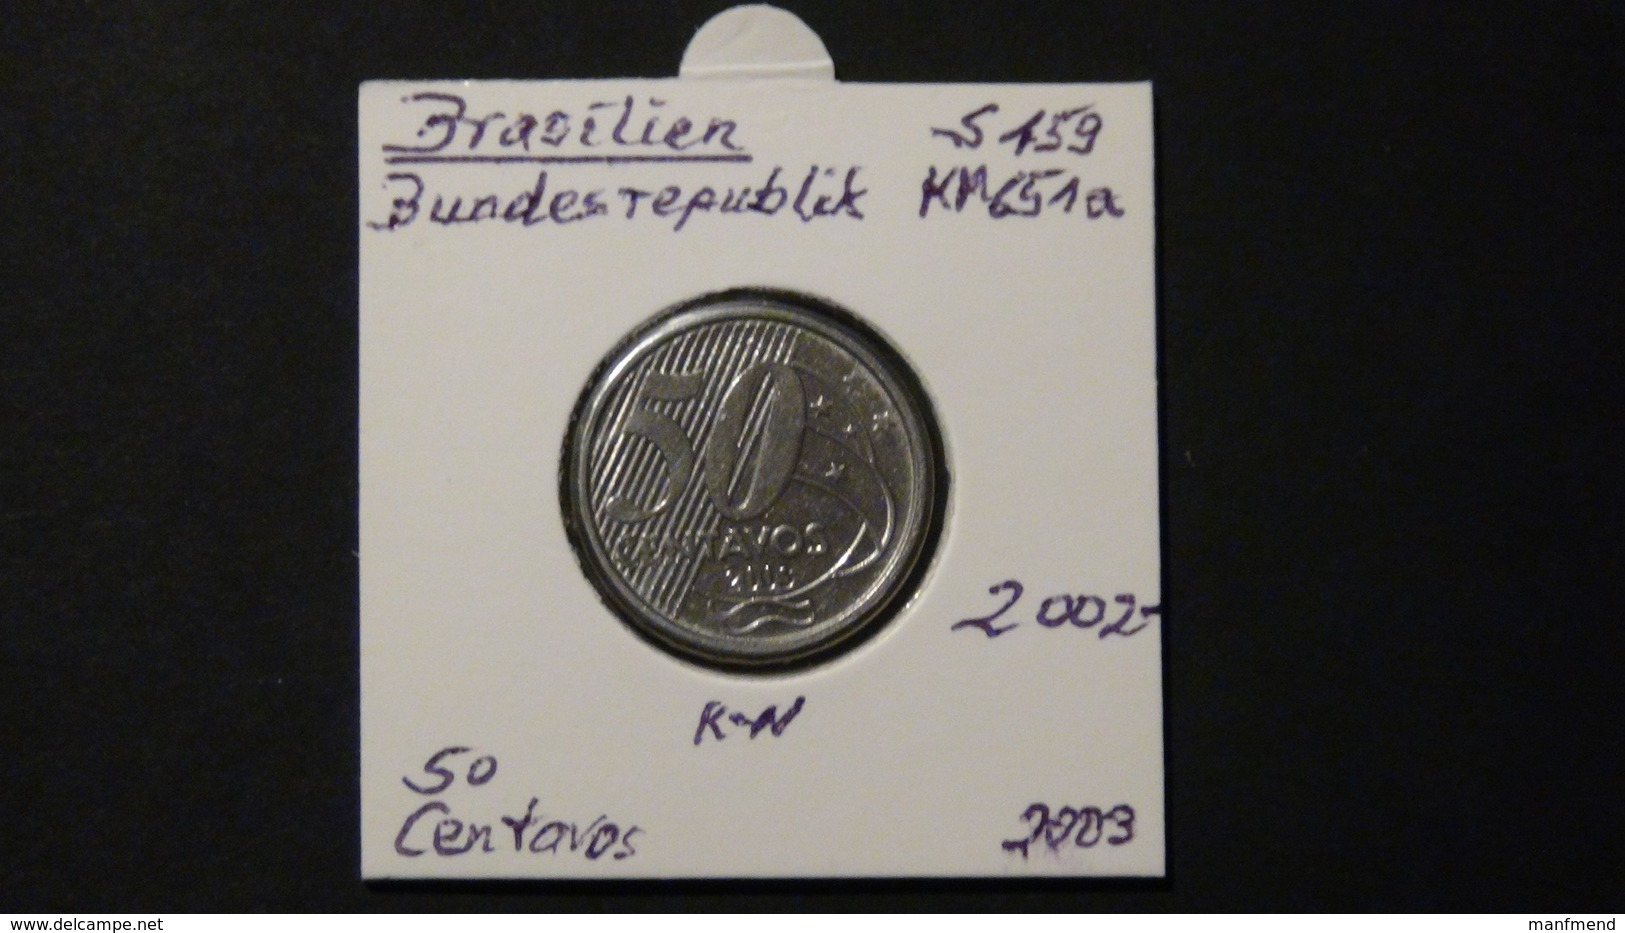 Brazil - 2003 - 50 Centavos - KM 651 - VF - Brasilien